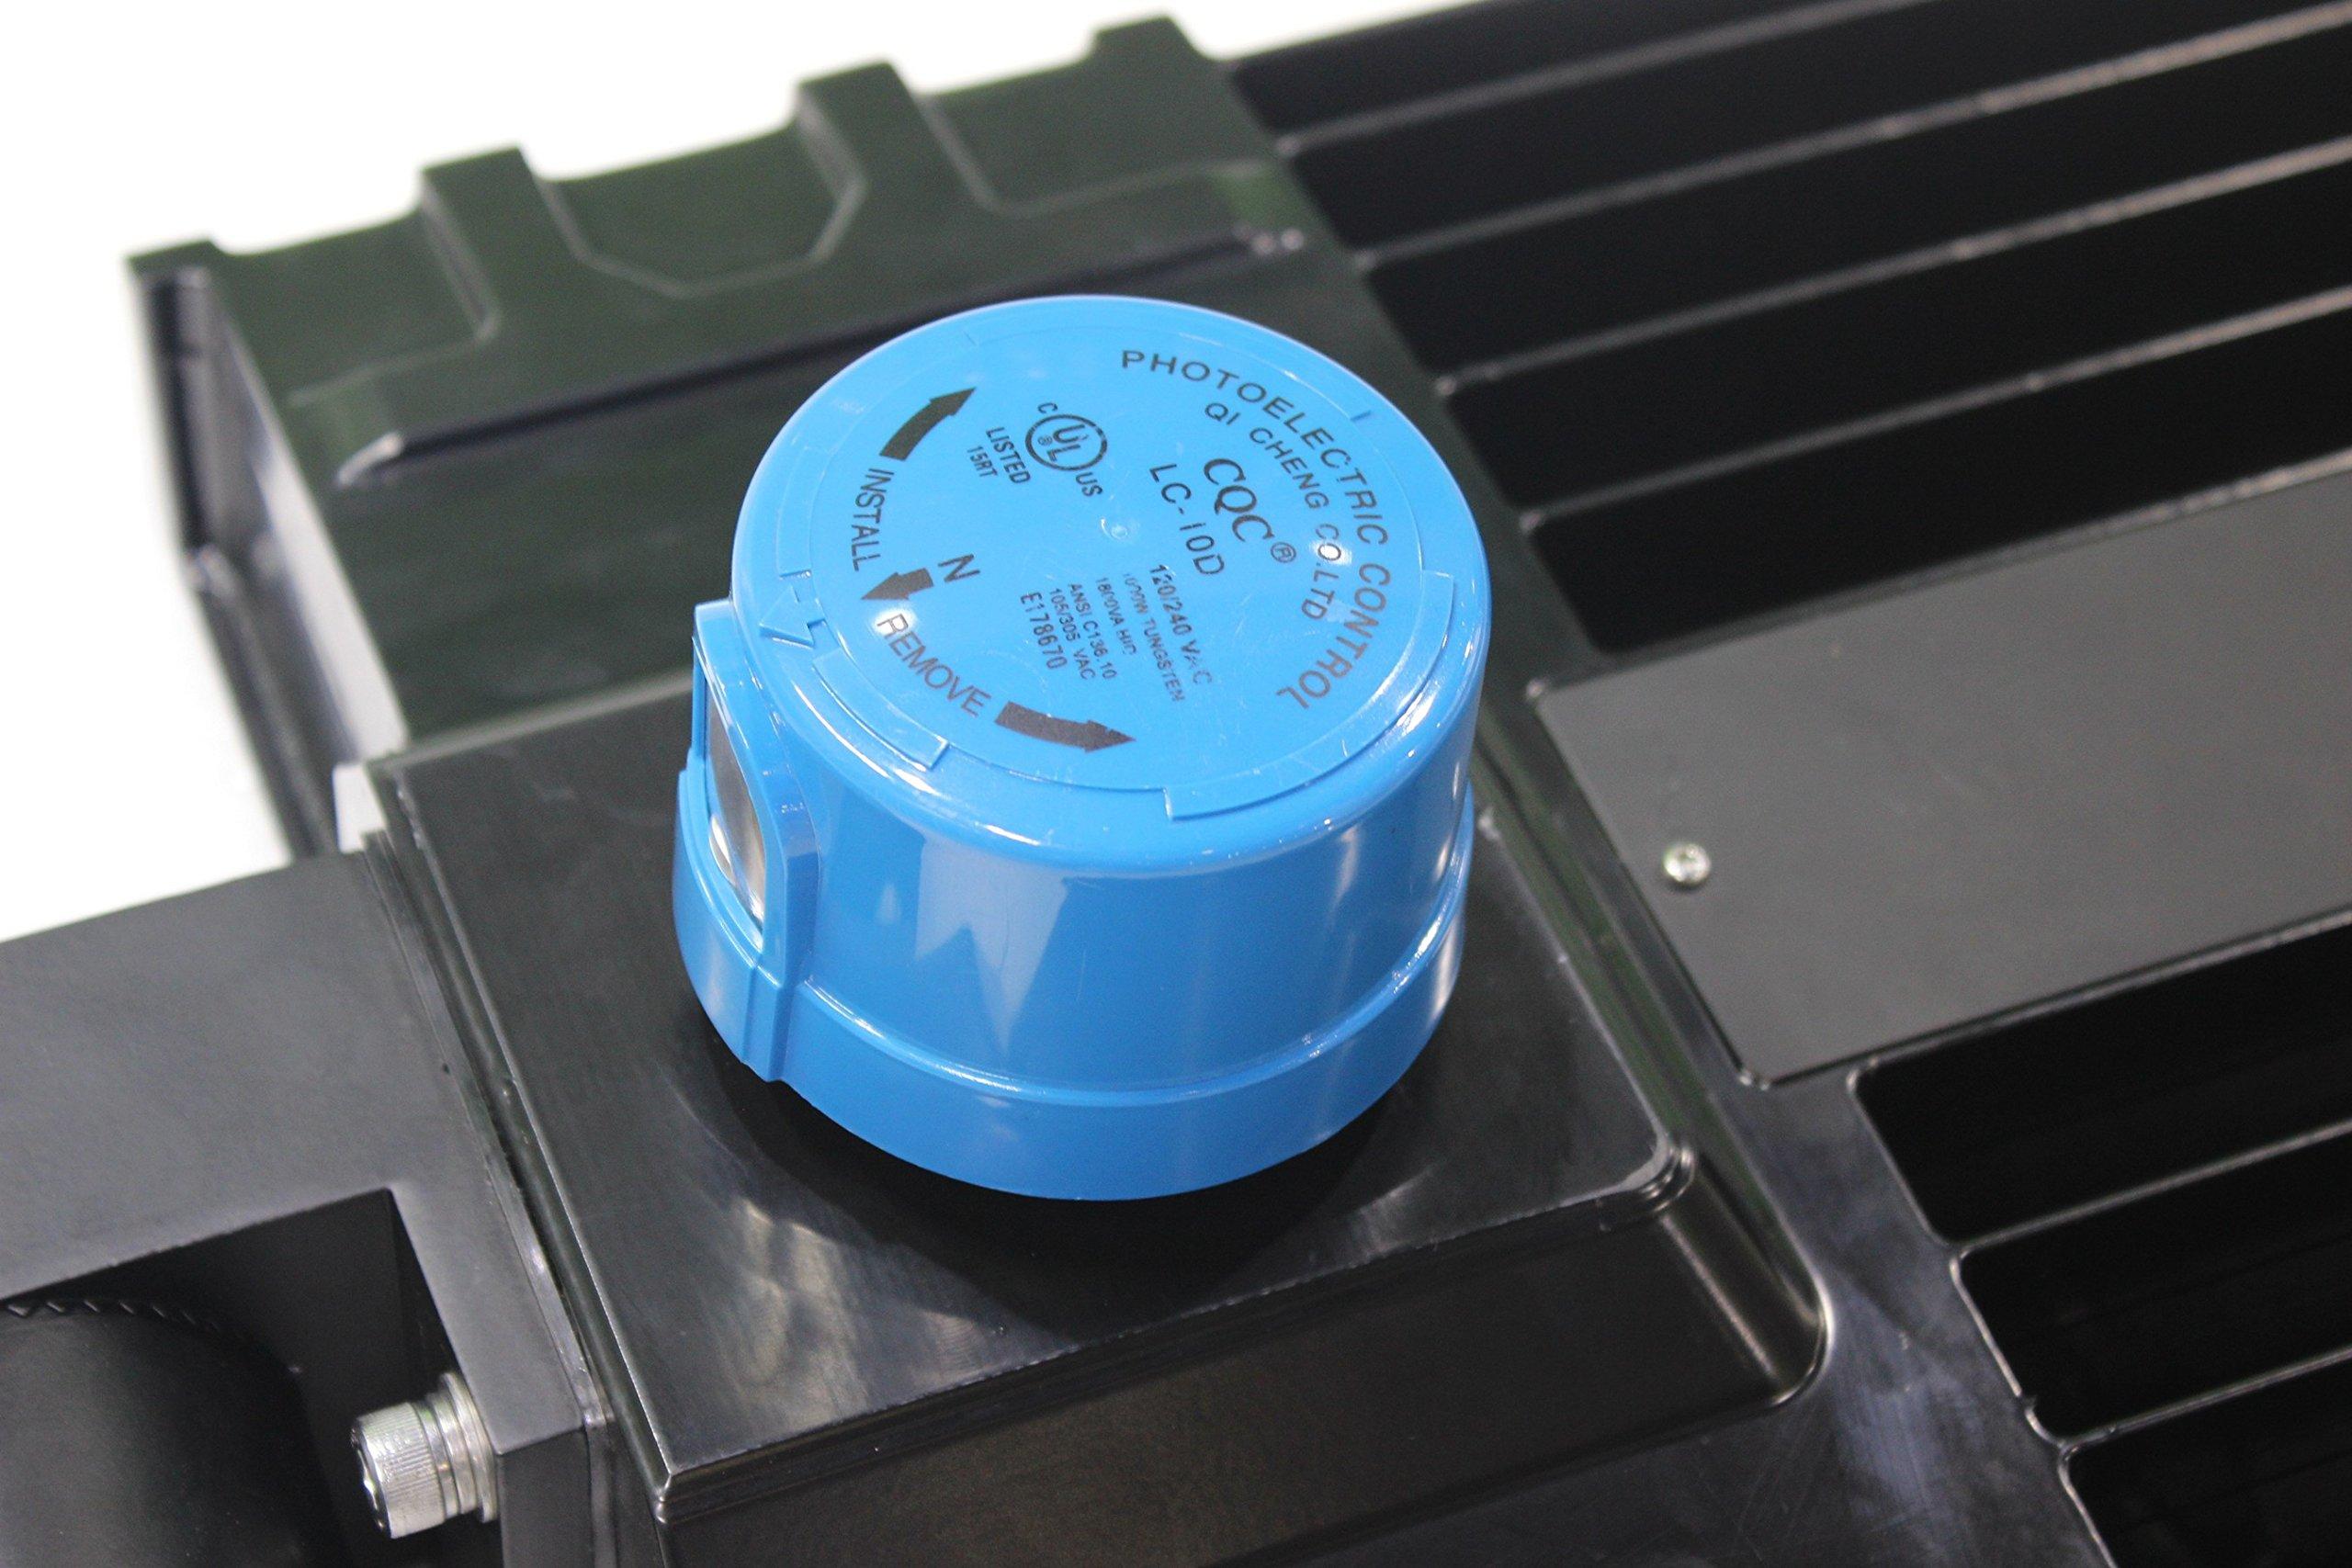 300 Watt NextGen LED Parking Lot Lights - 40,000 Lumen - Super Efficiency 130 Lumen to Watt - 5000K Bright White - Replaces 1000W Halide - LED Shoebox Lights - Slip Fit Mount - With photocell by RuggedGrade (Image #3)